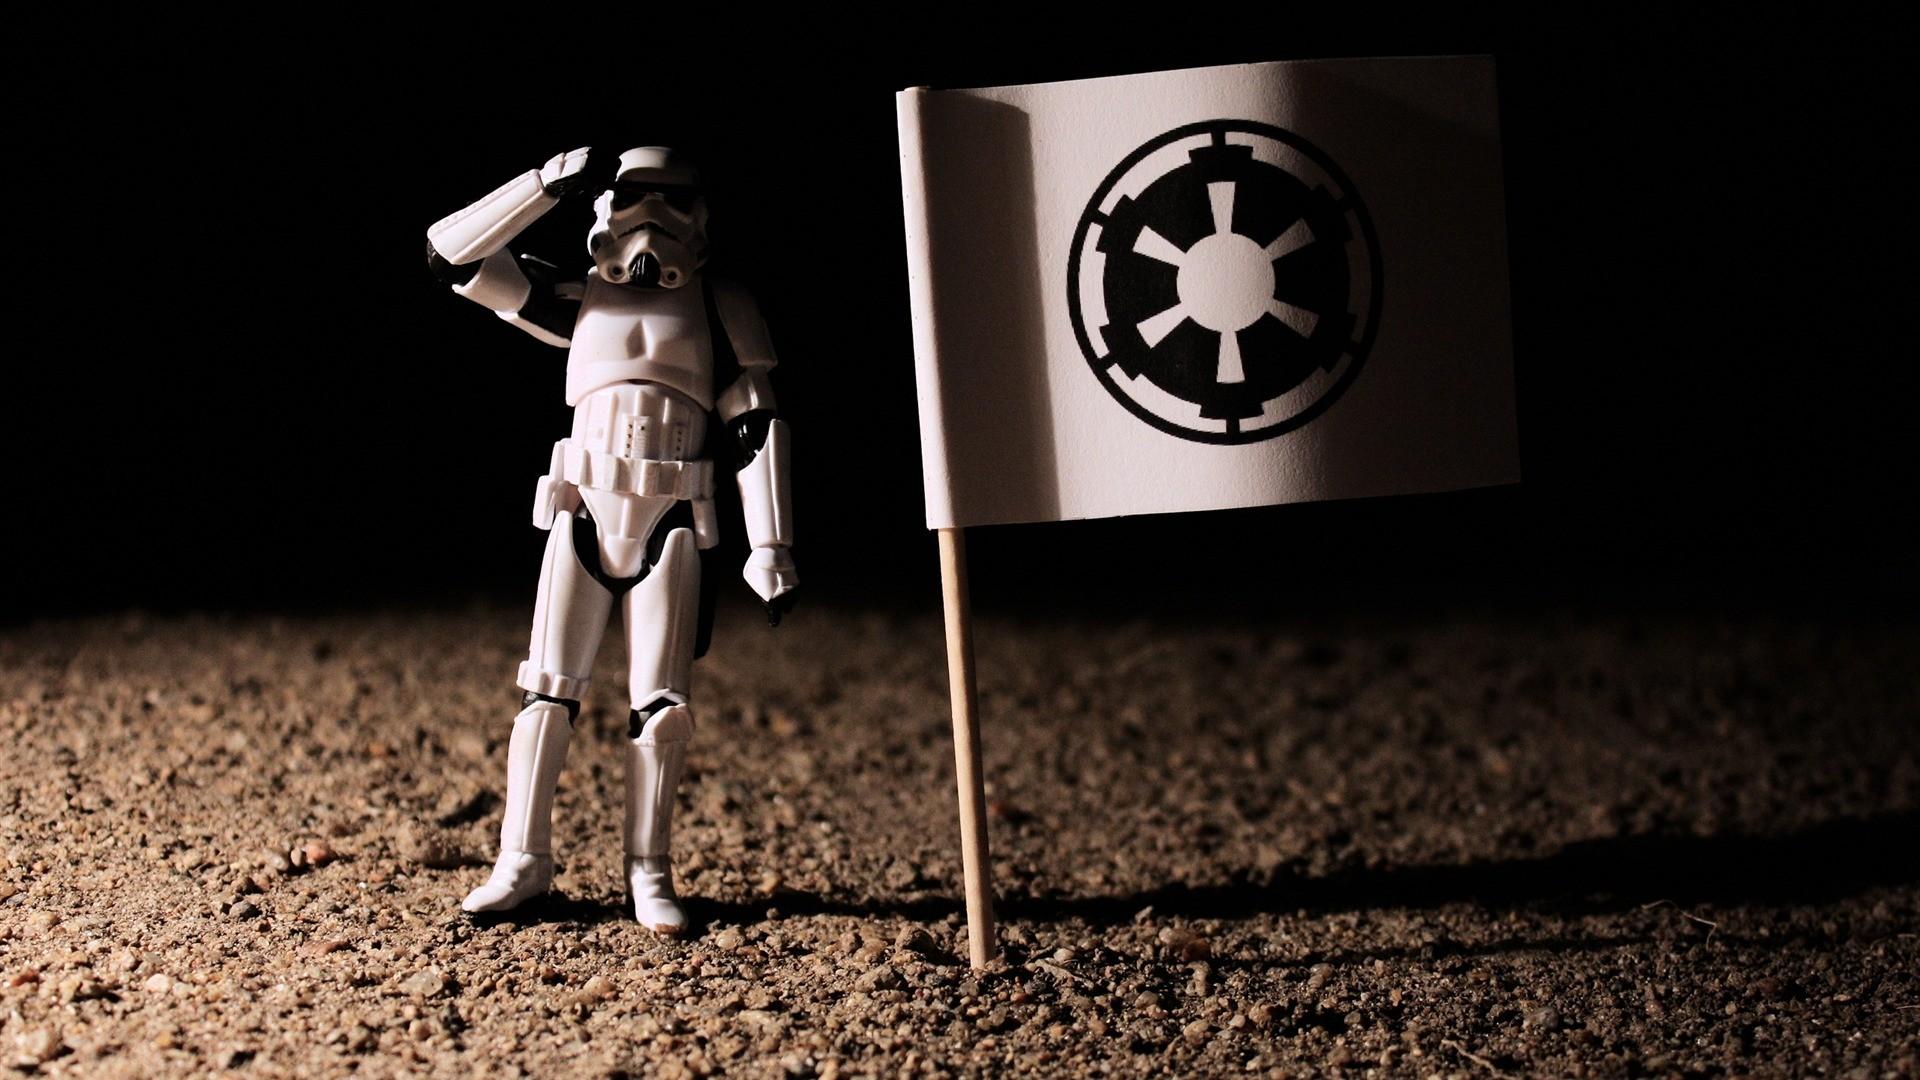 greetings from the moon-Imperial Stormtrooper series desktop wallpaper –  wallpaper download